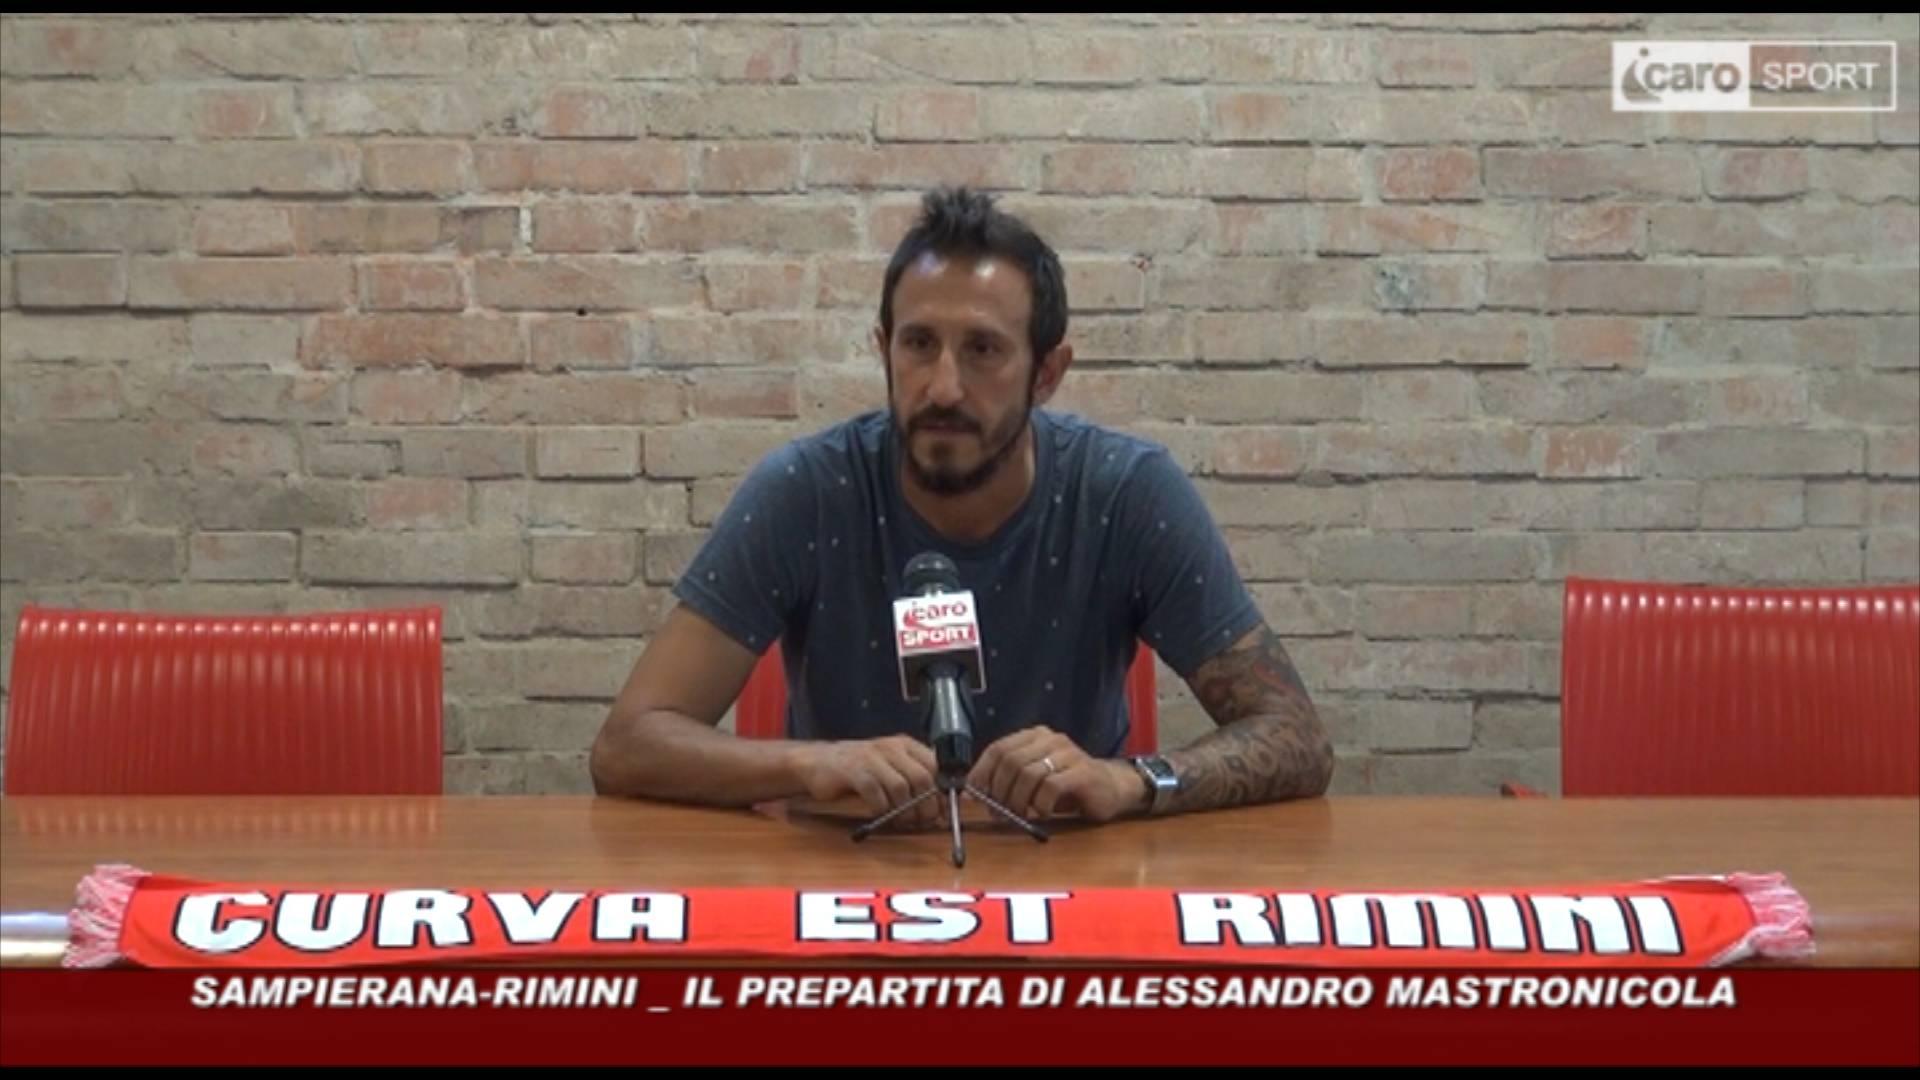 verso Sampierana-Rimini